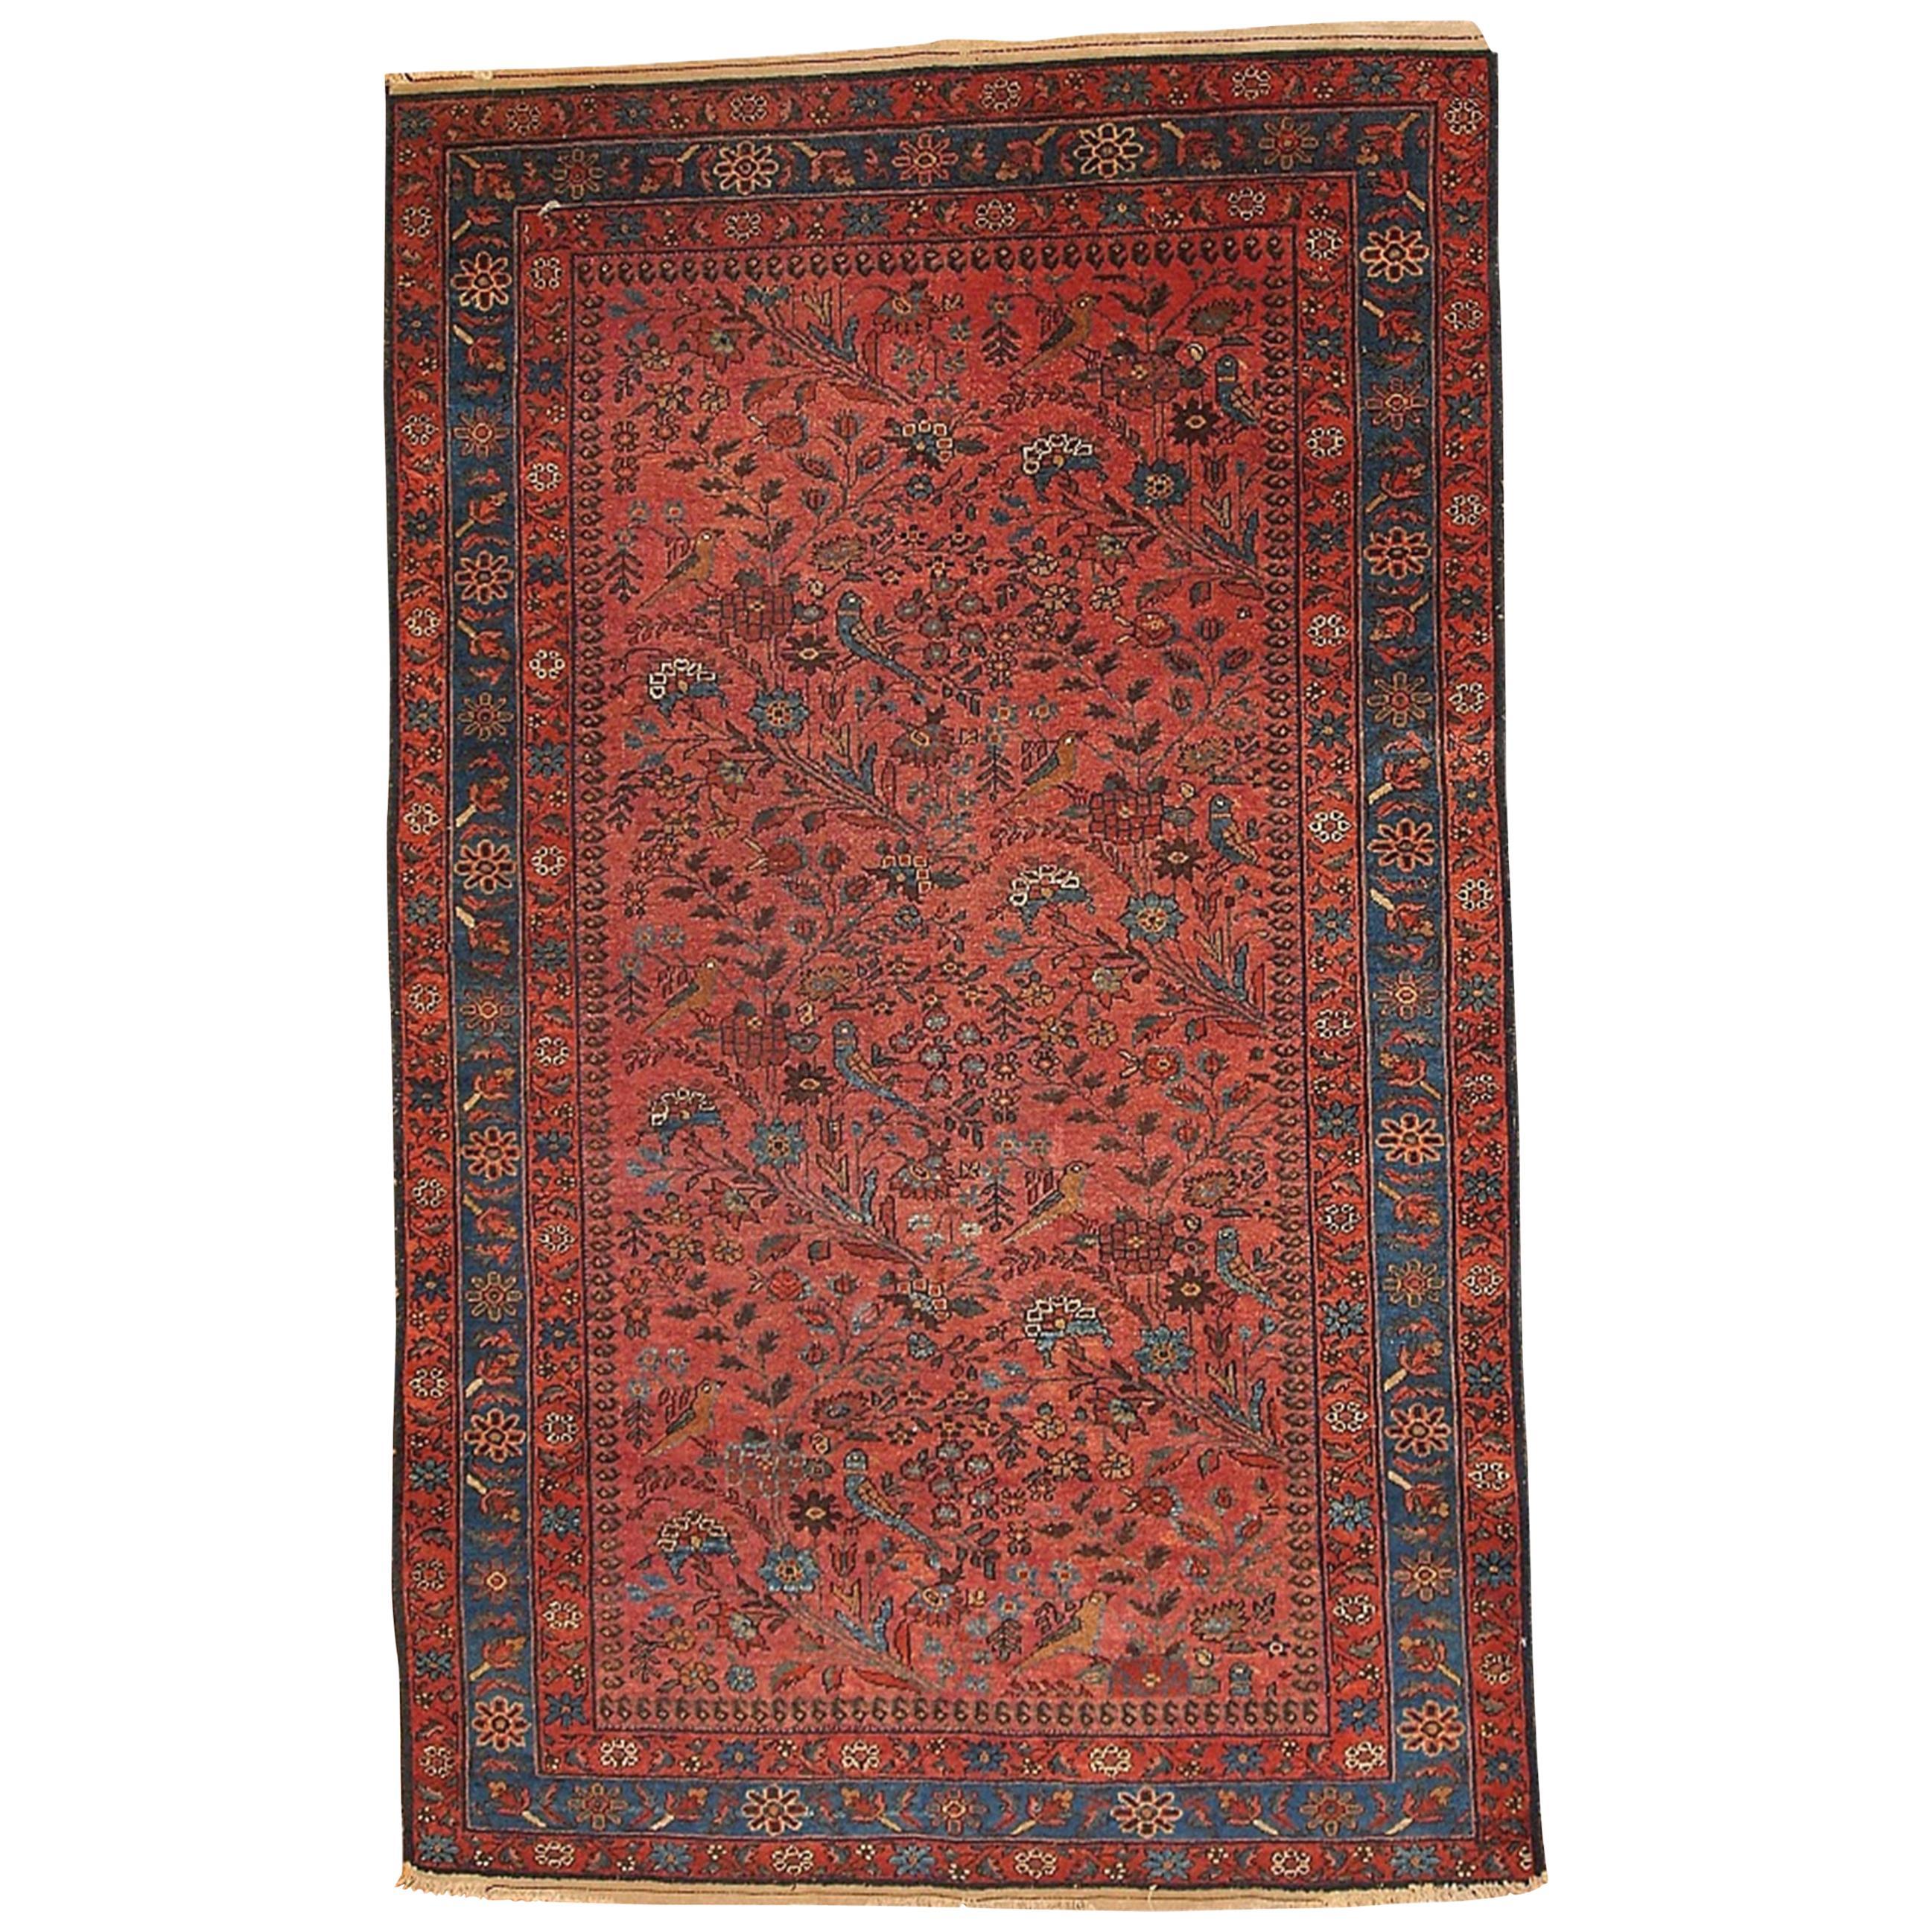 Handmade Antique Lilihan Style Rug, 1920s, 1B129